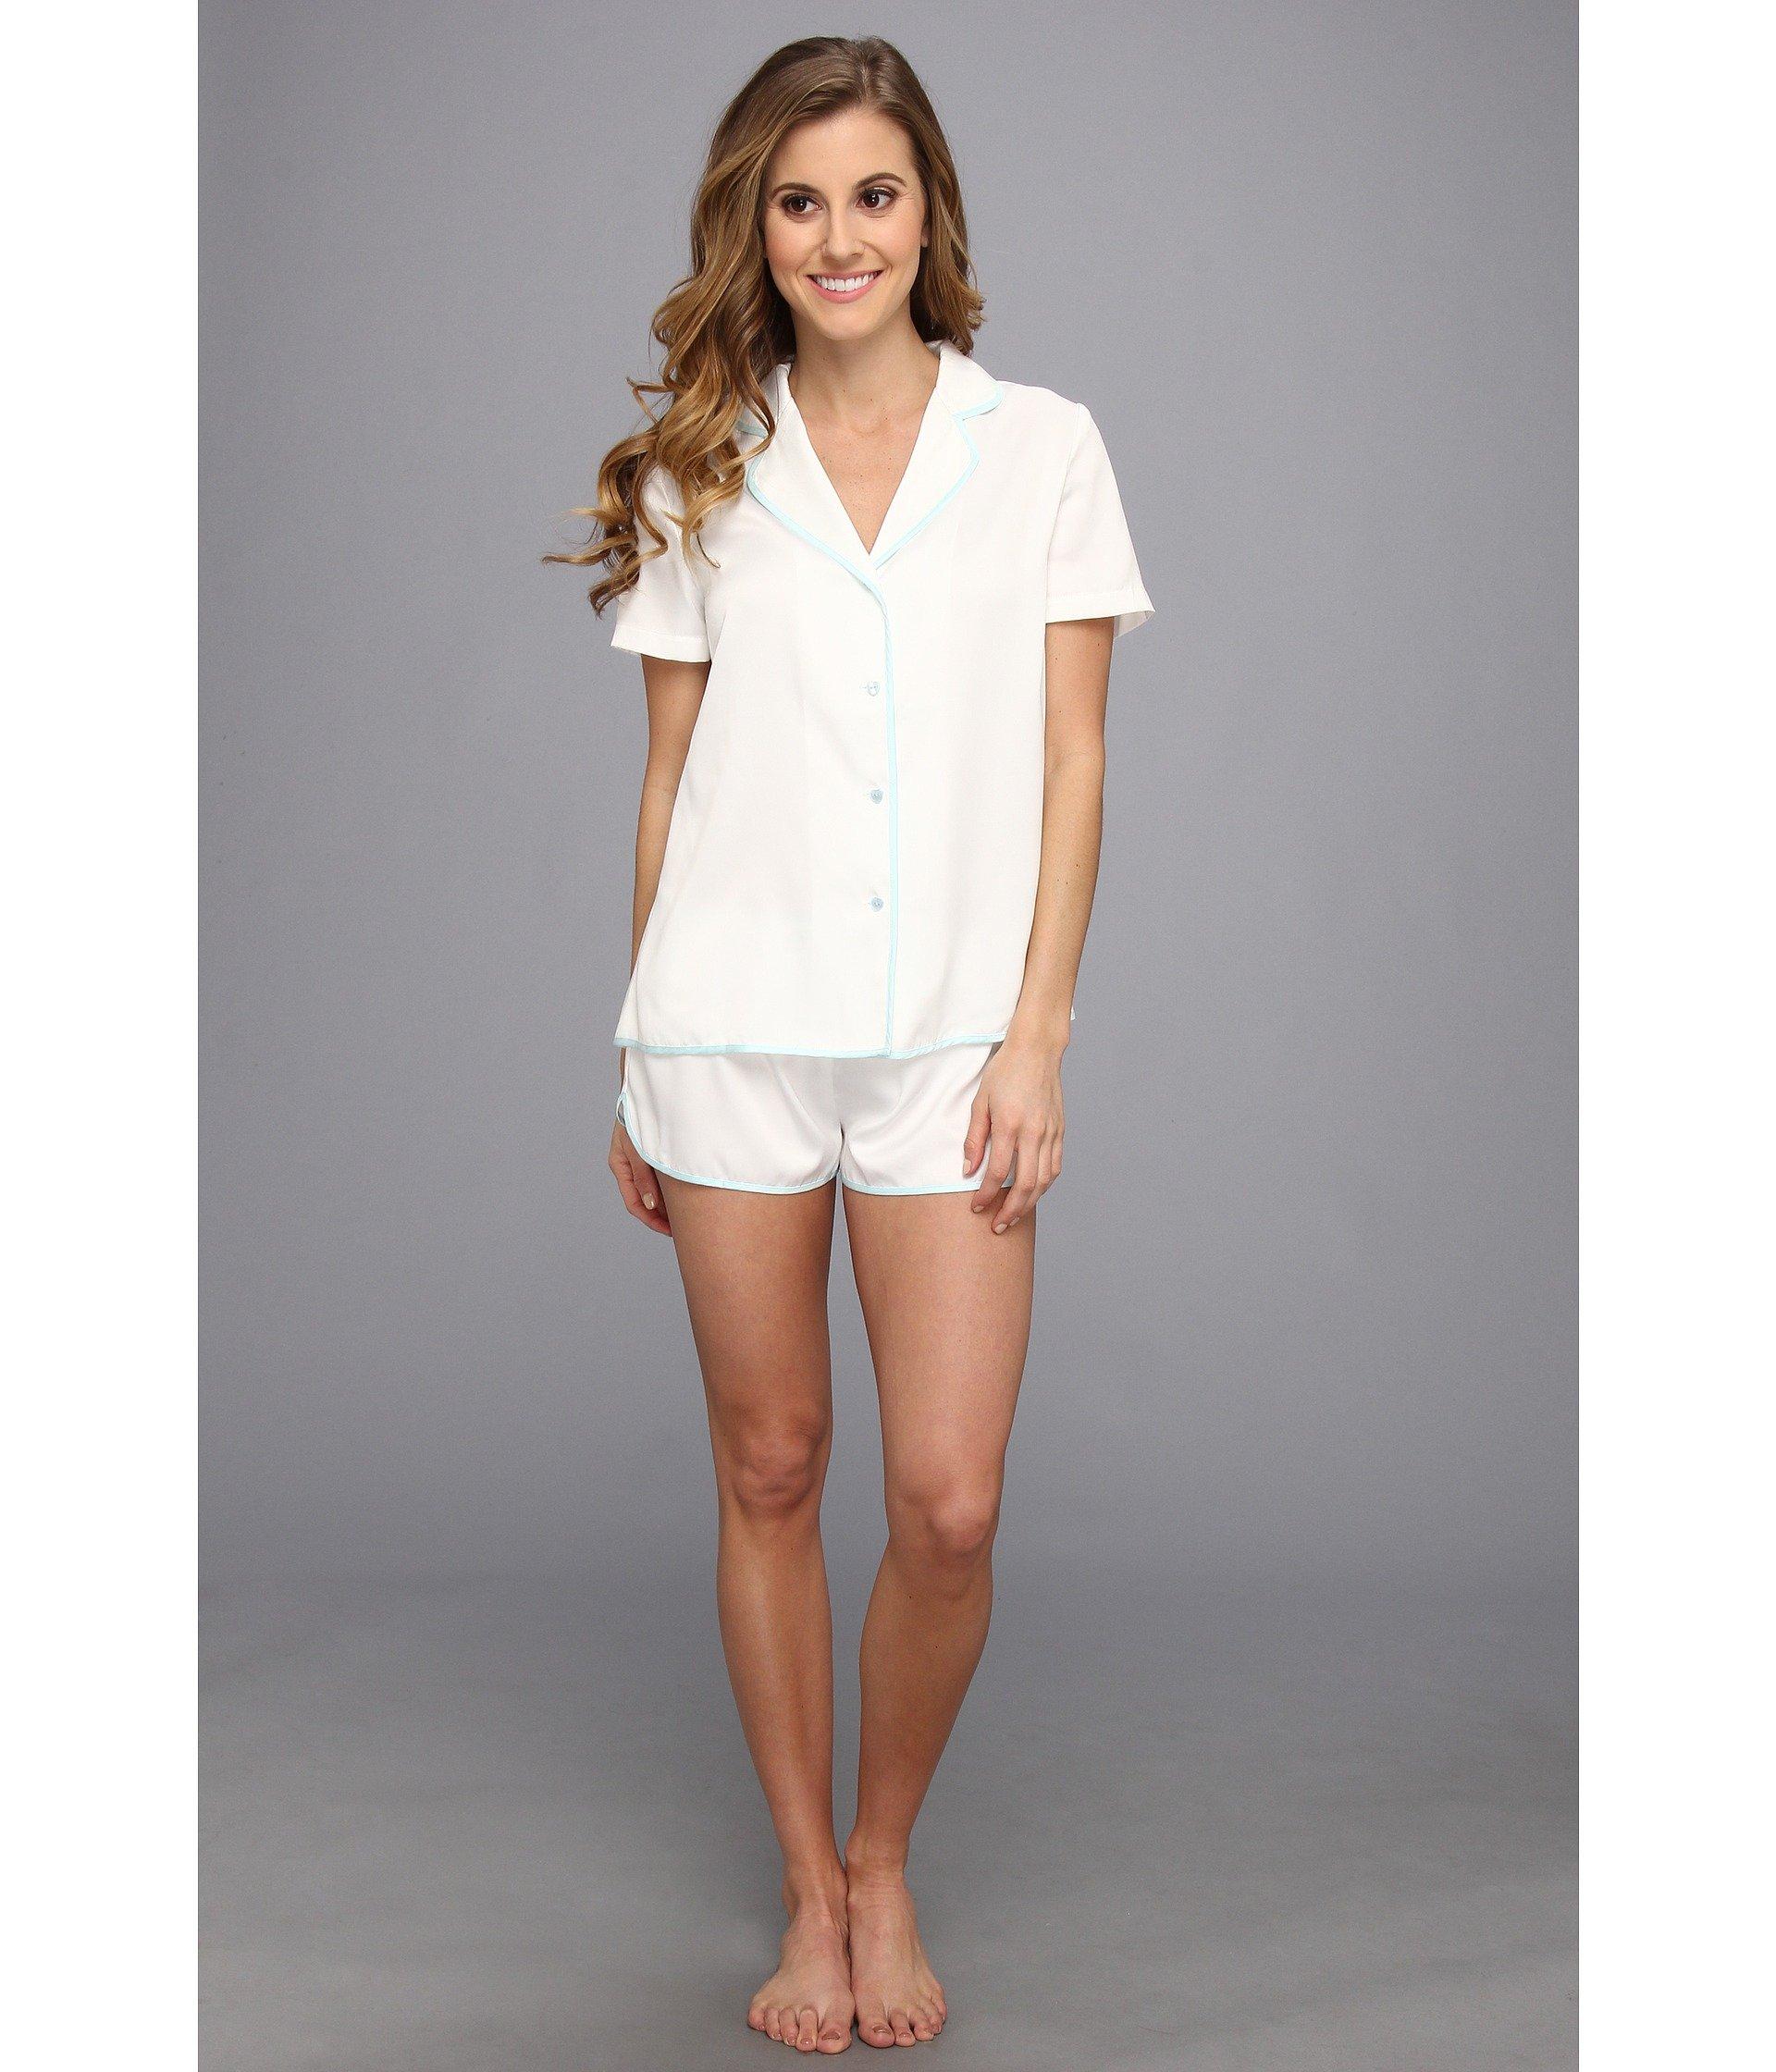 Betsey Johnson Bridal Satin Short Pajama Set 731707 In